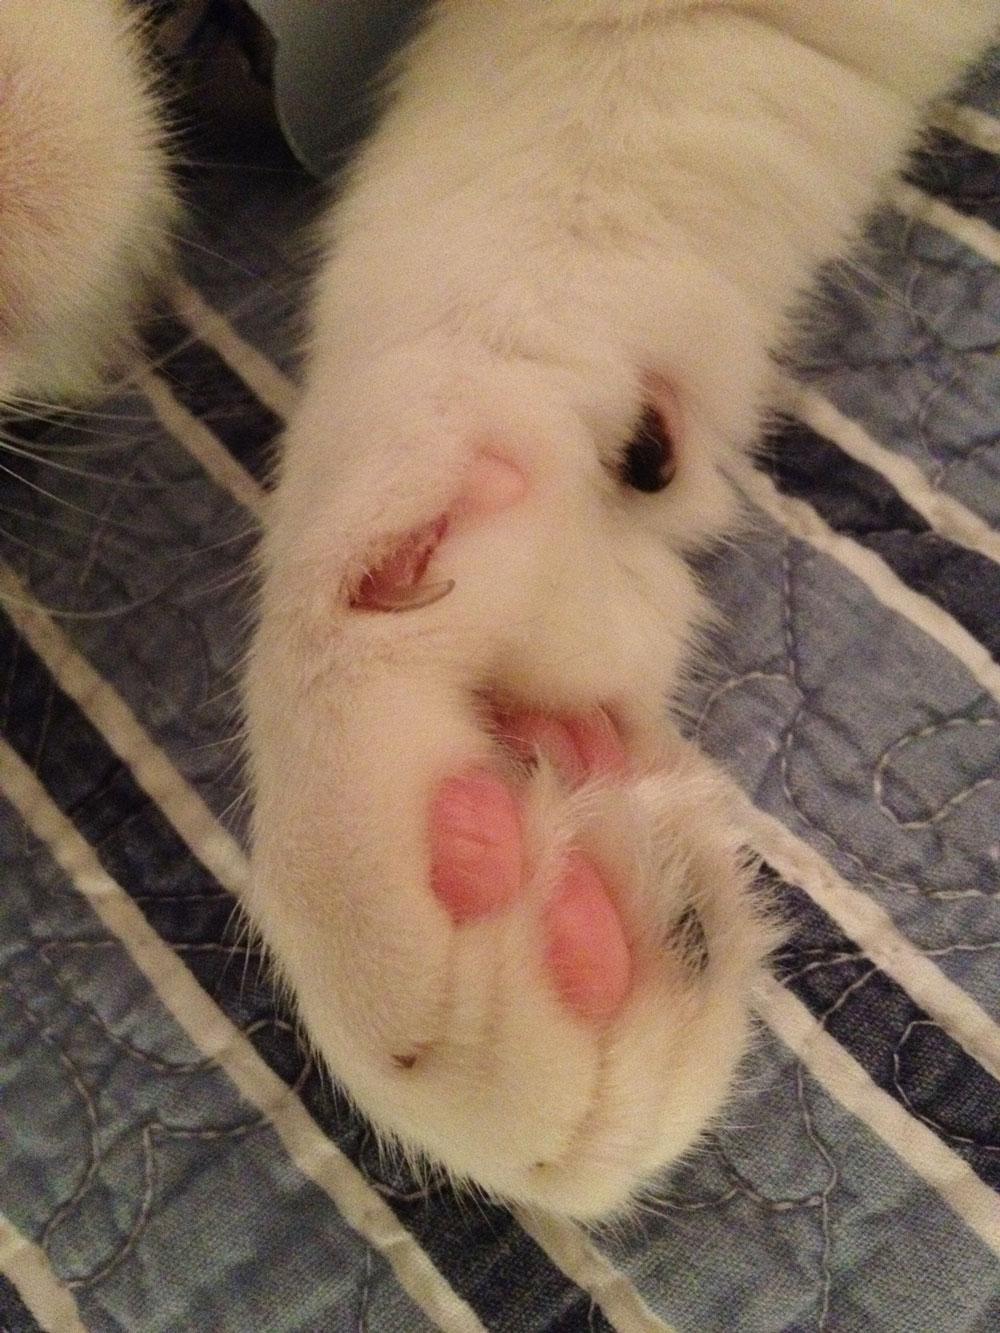 cat scratch fever ted nugent